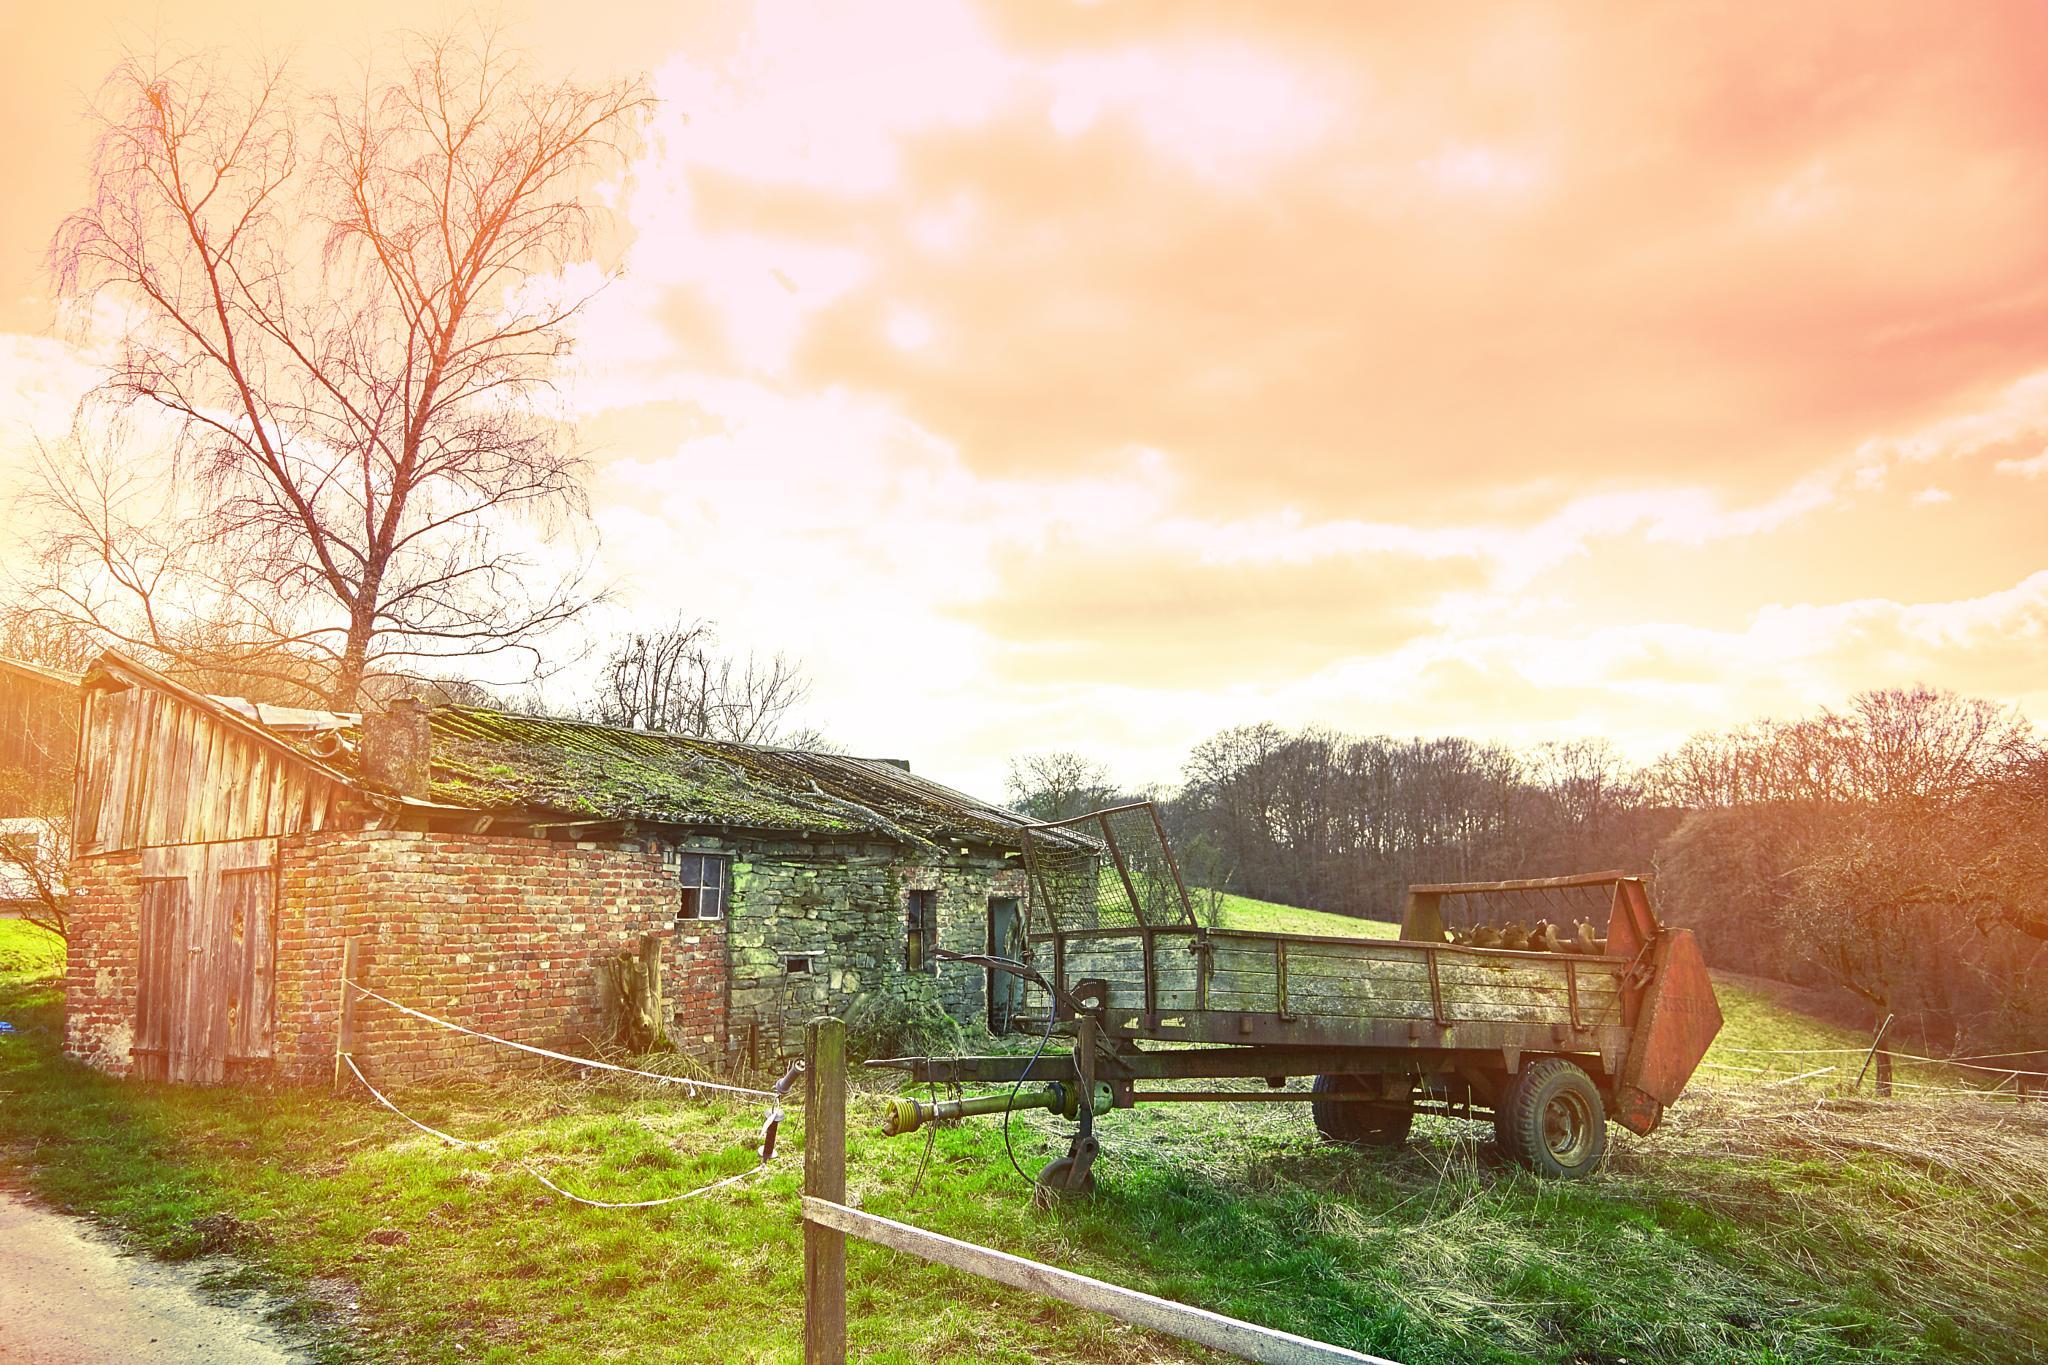 A lovely farm scene by Phillipp rnold